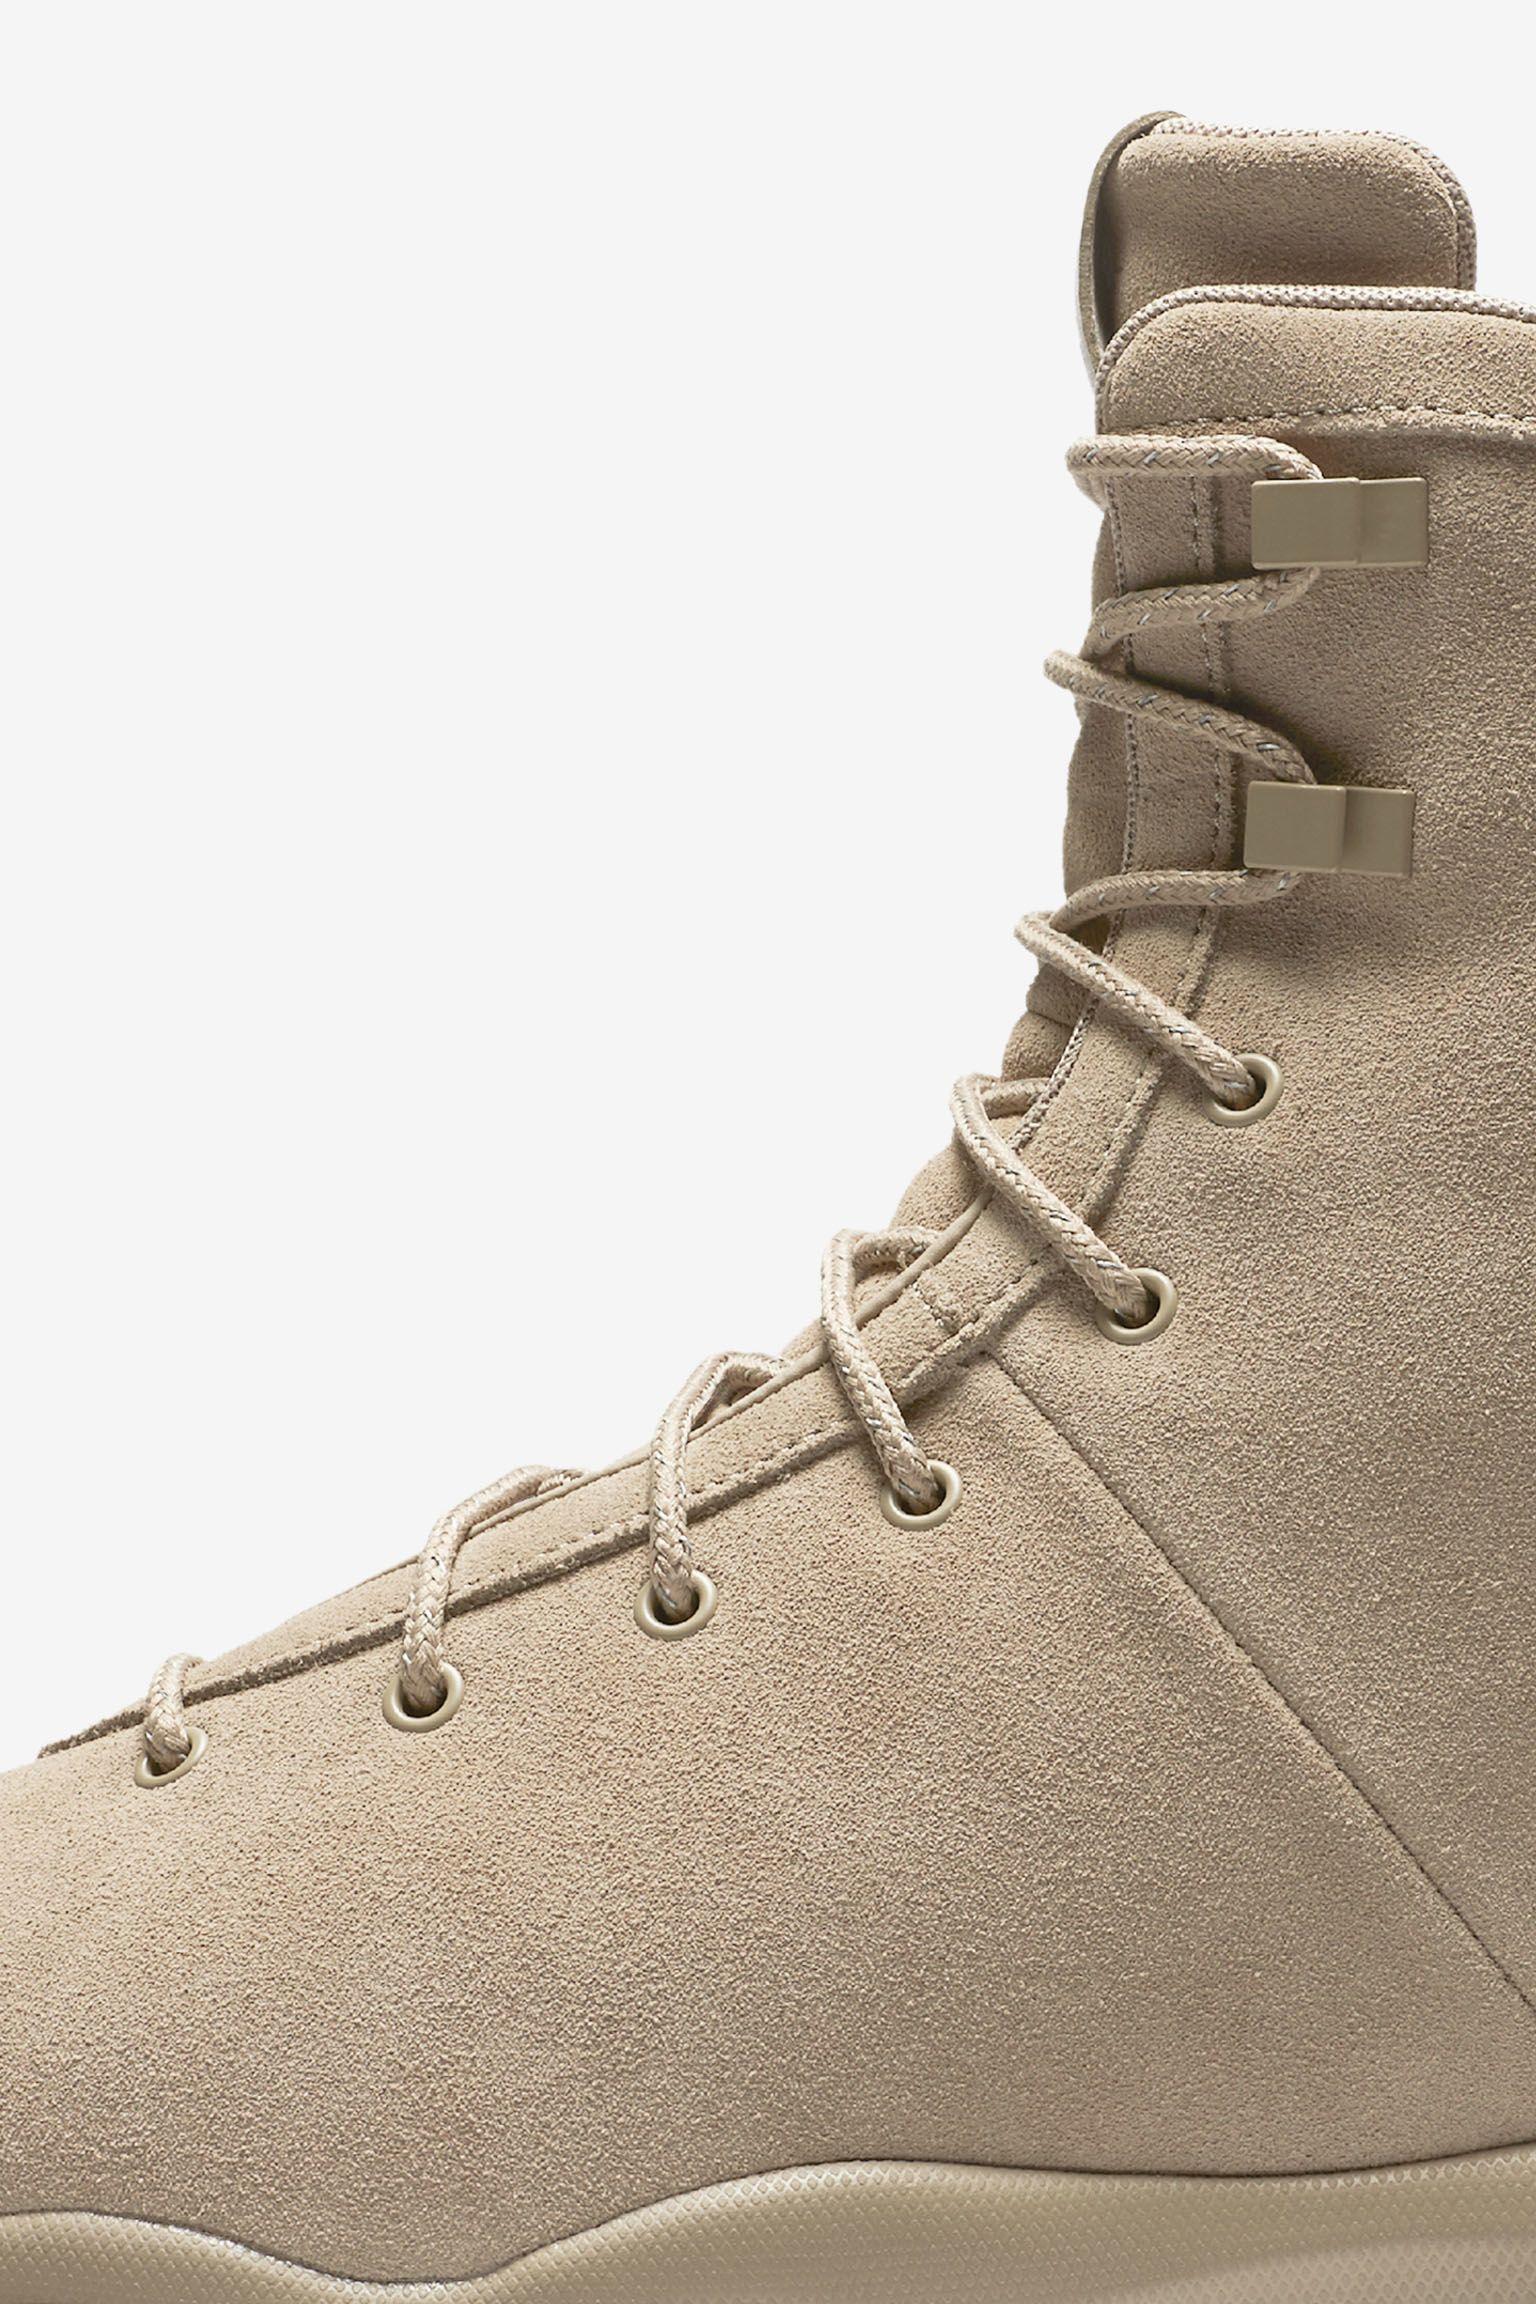 Jordan Future Boot EP 'Khaki'